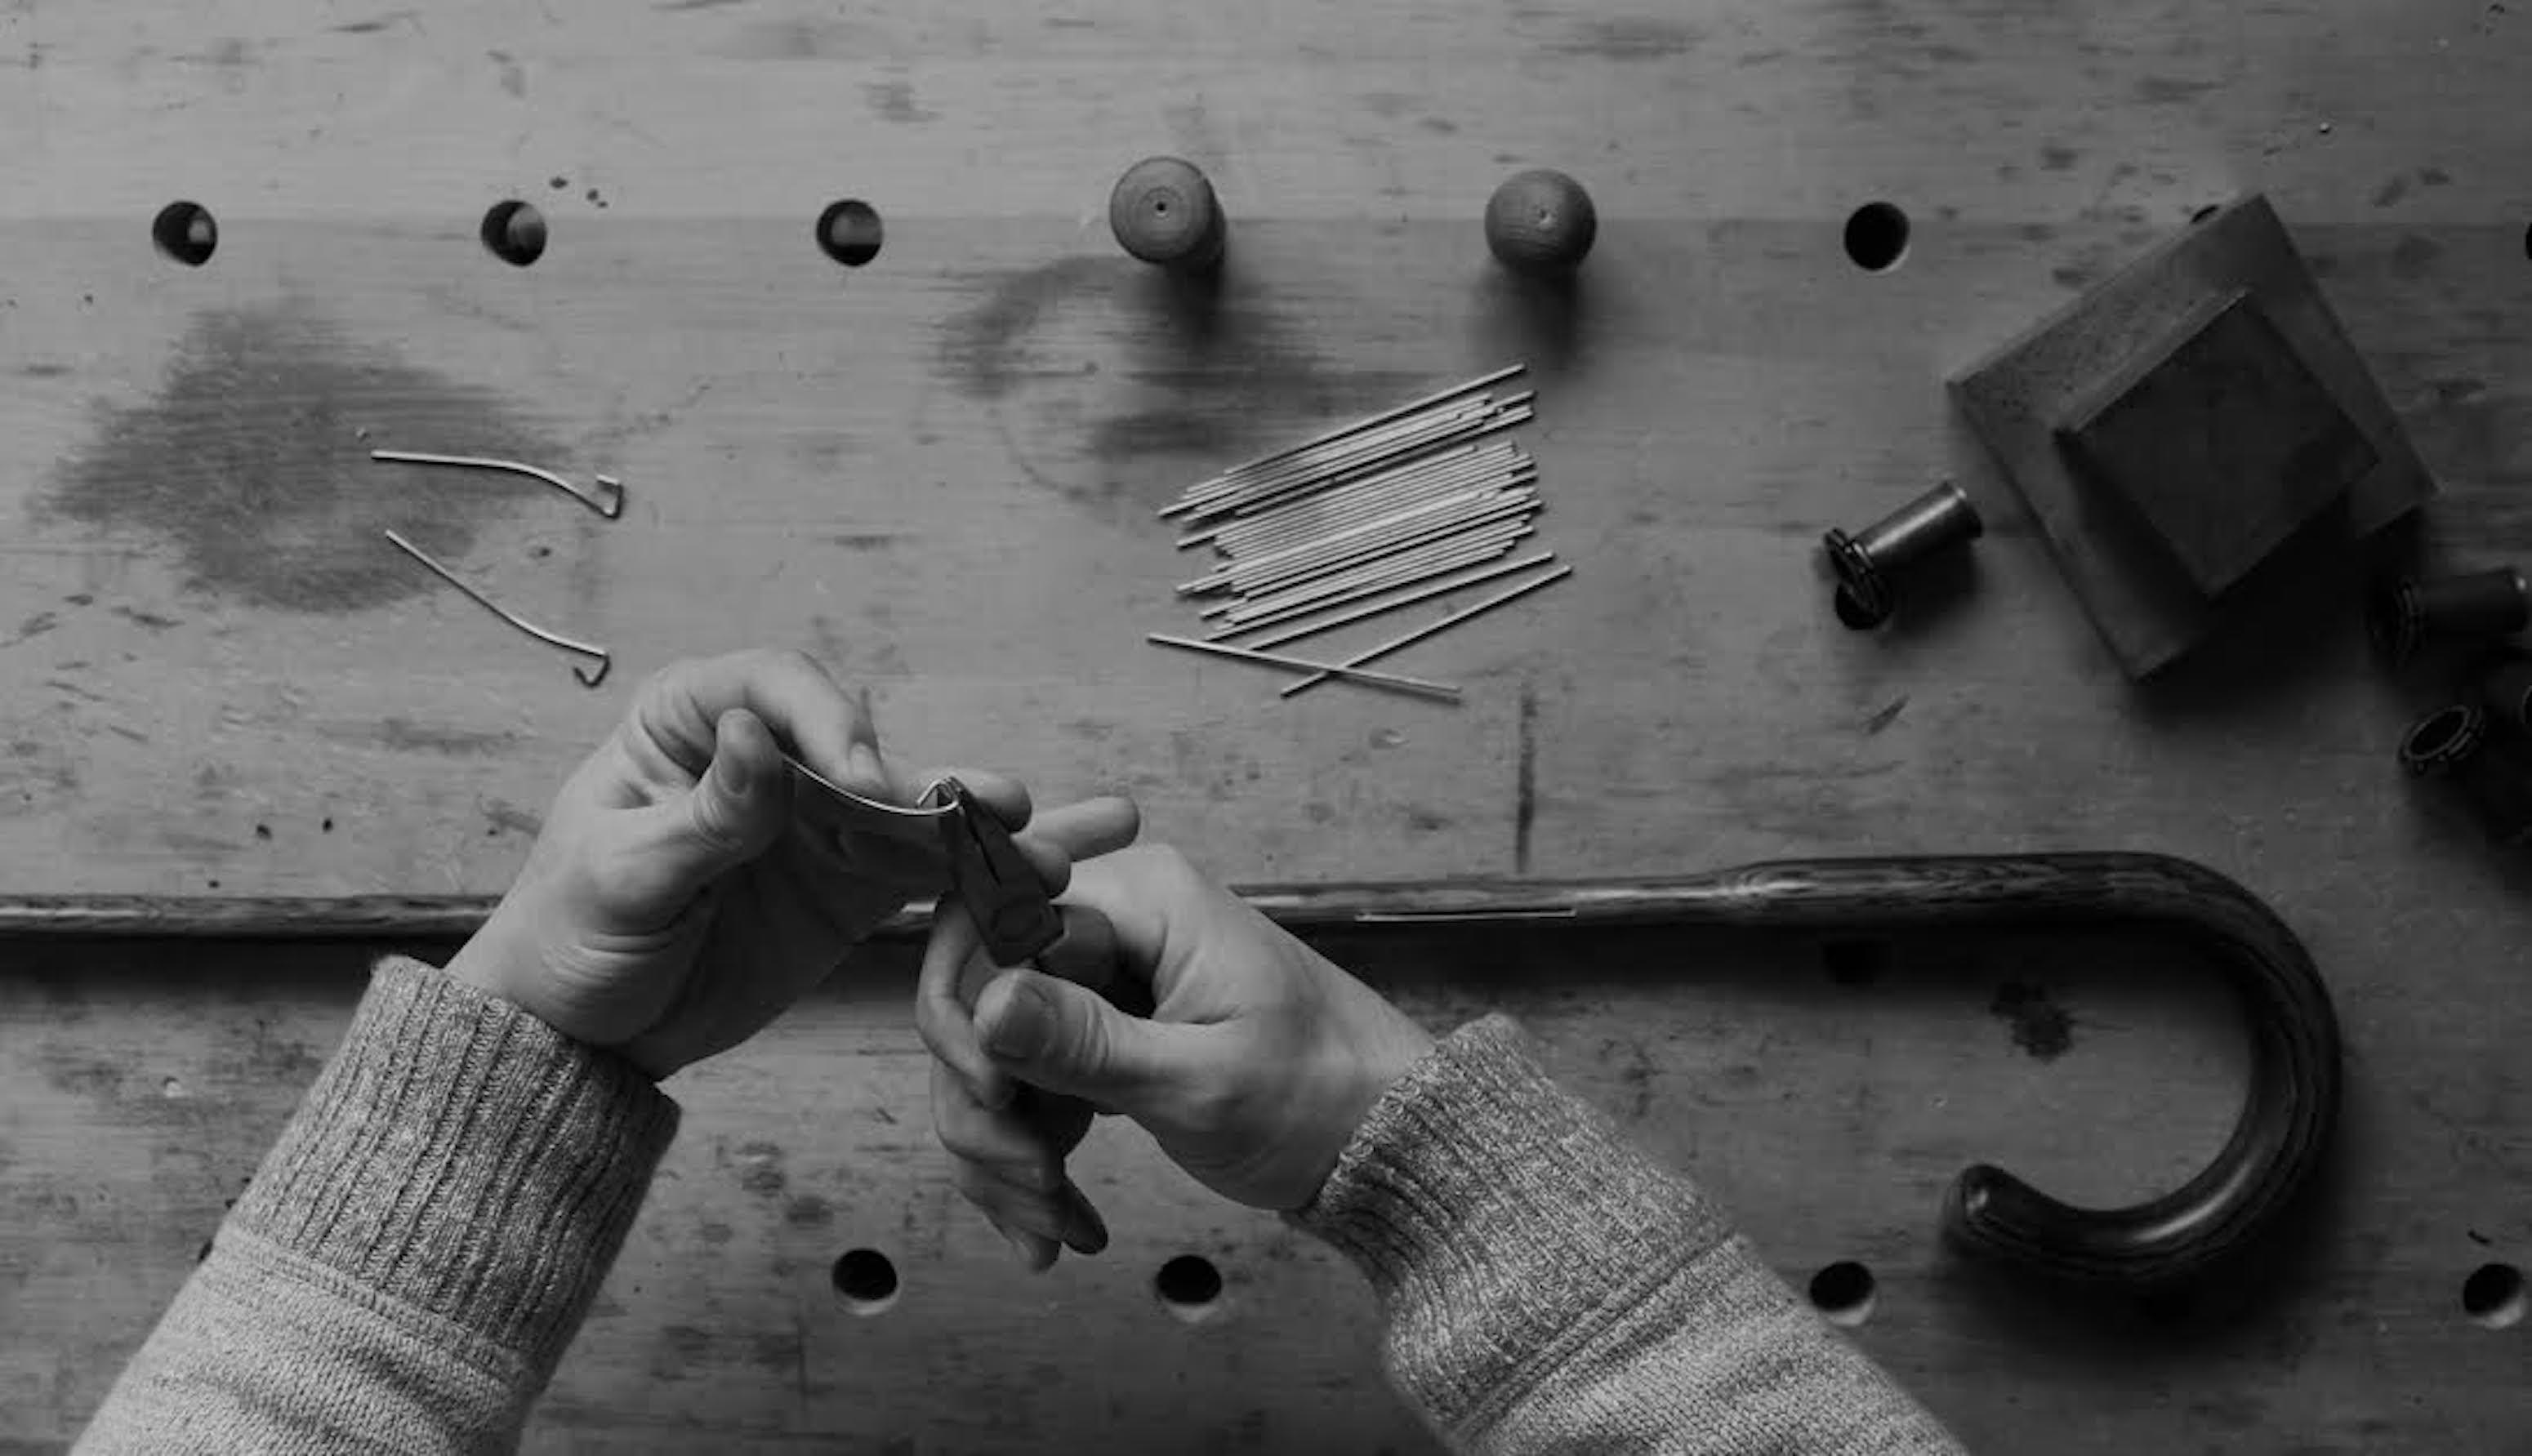 LOCKWOOD UMBRELLAS - Handmade in London, England. Lockwood